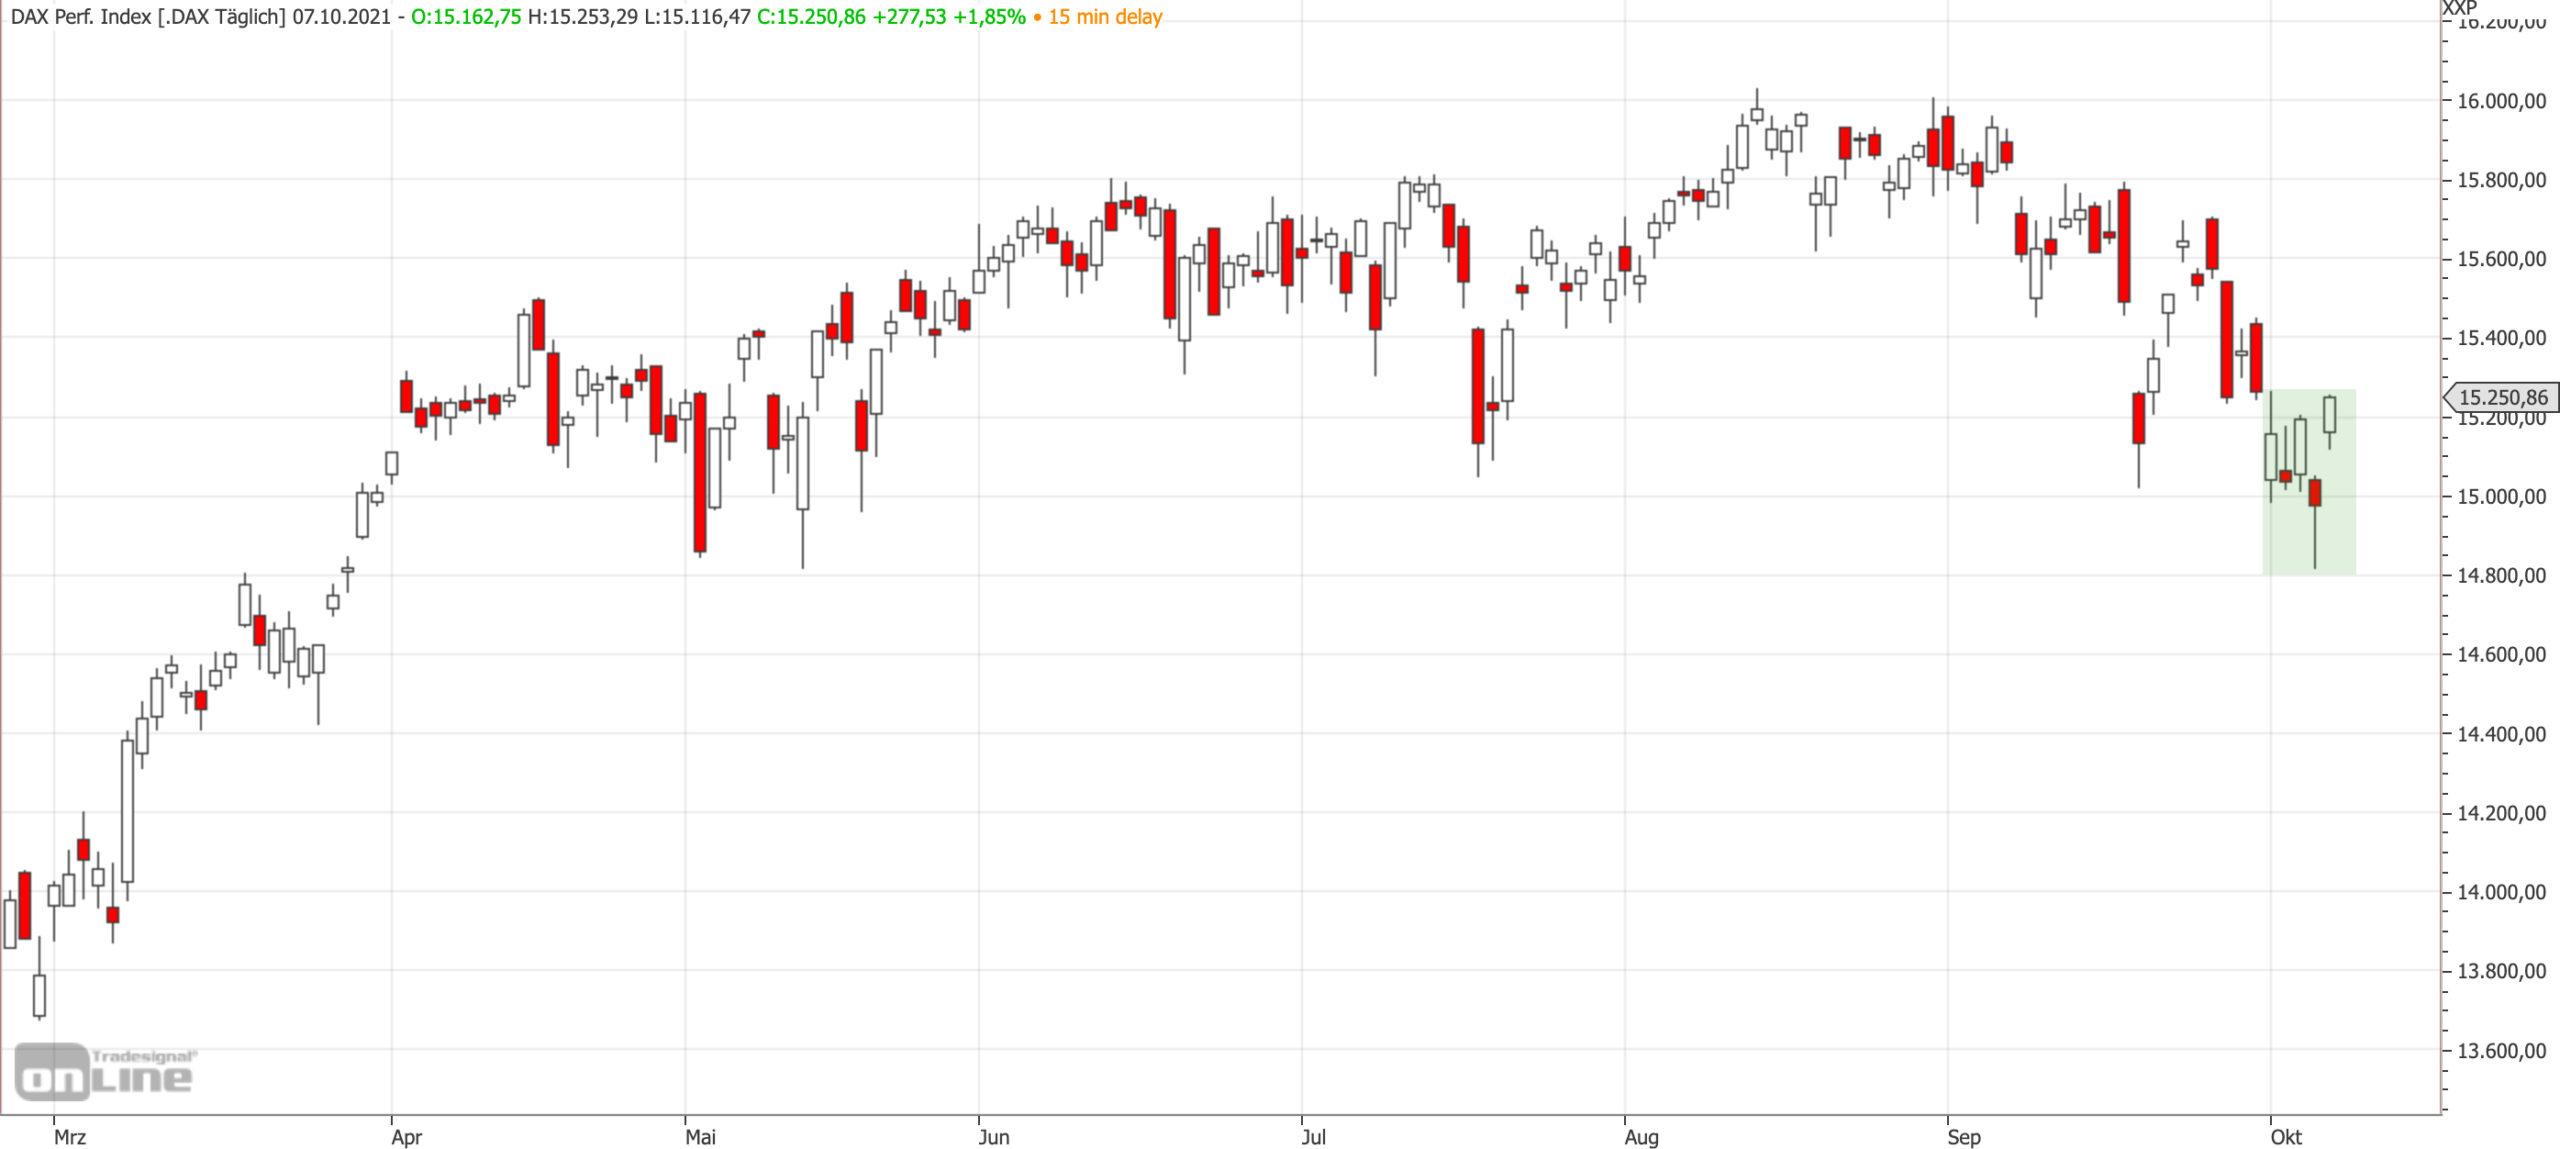 Mittelfristiger DAX-Chart am 07.10.2021